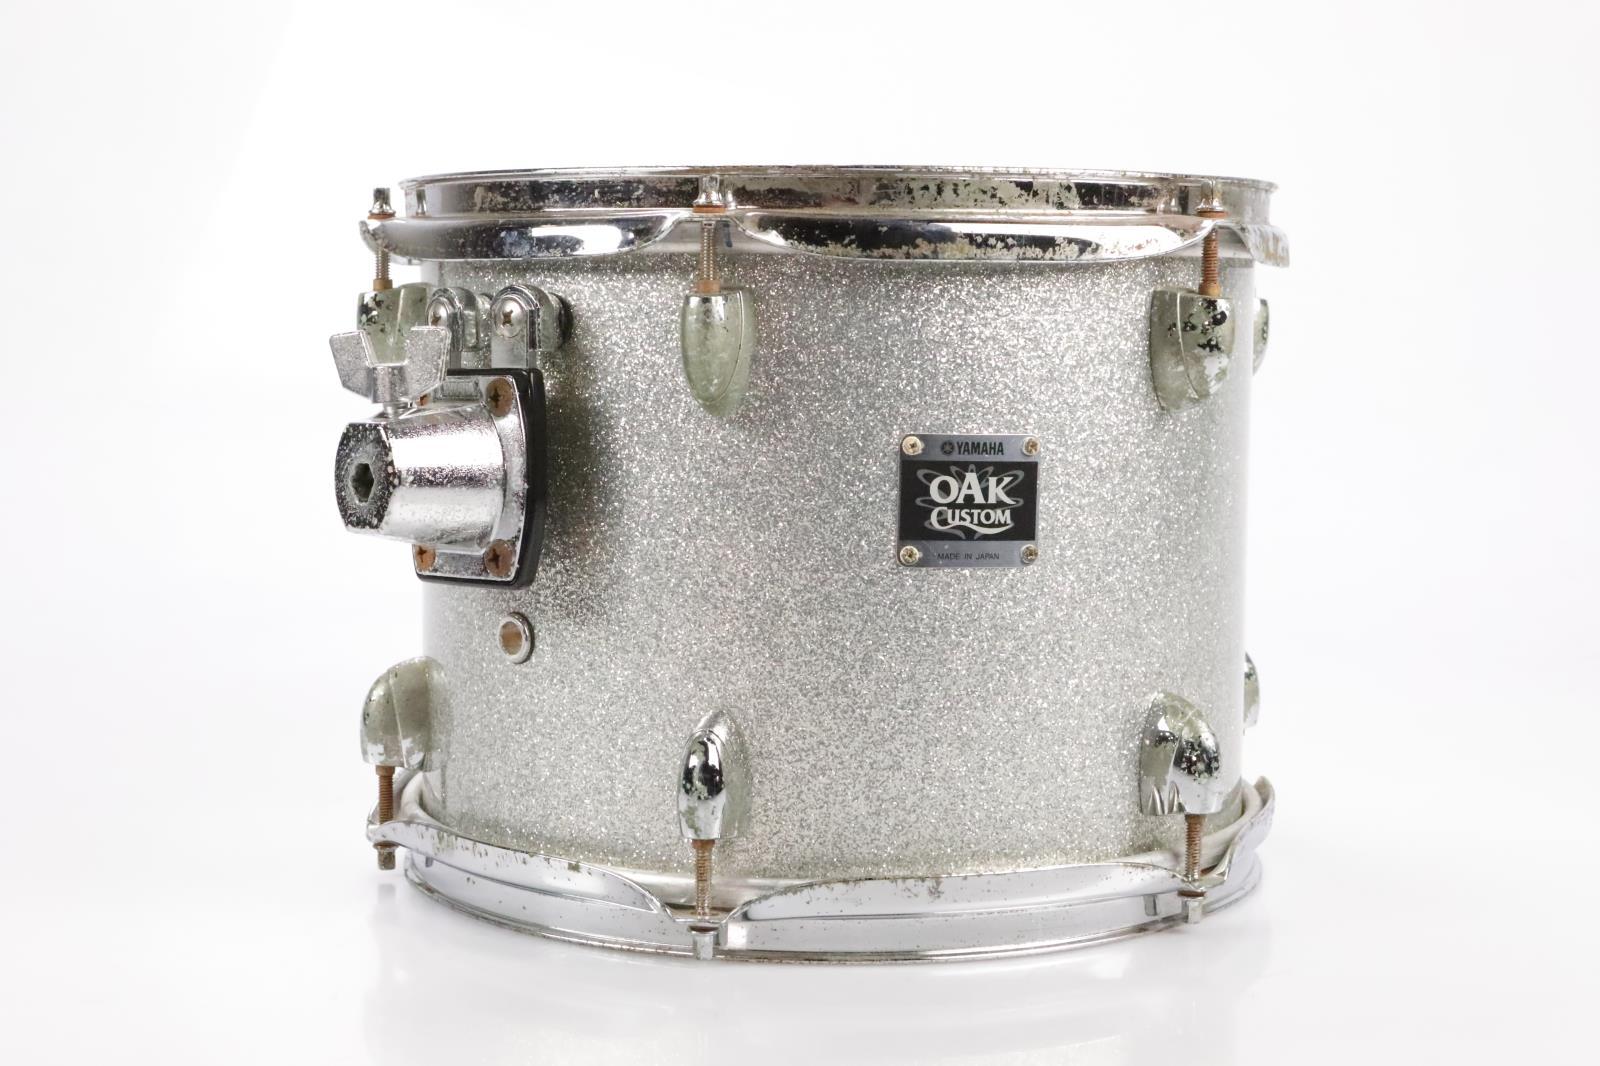 Yamaha 12x9 Oak Custom Rack Tom Drum Japan Silver Sparkle #35015